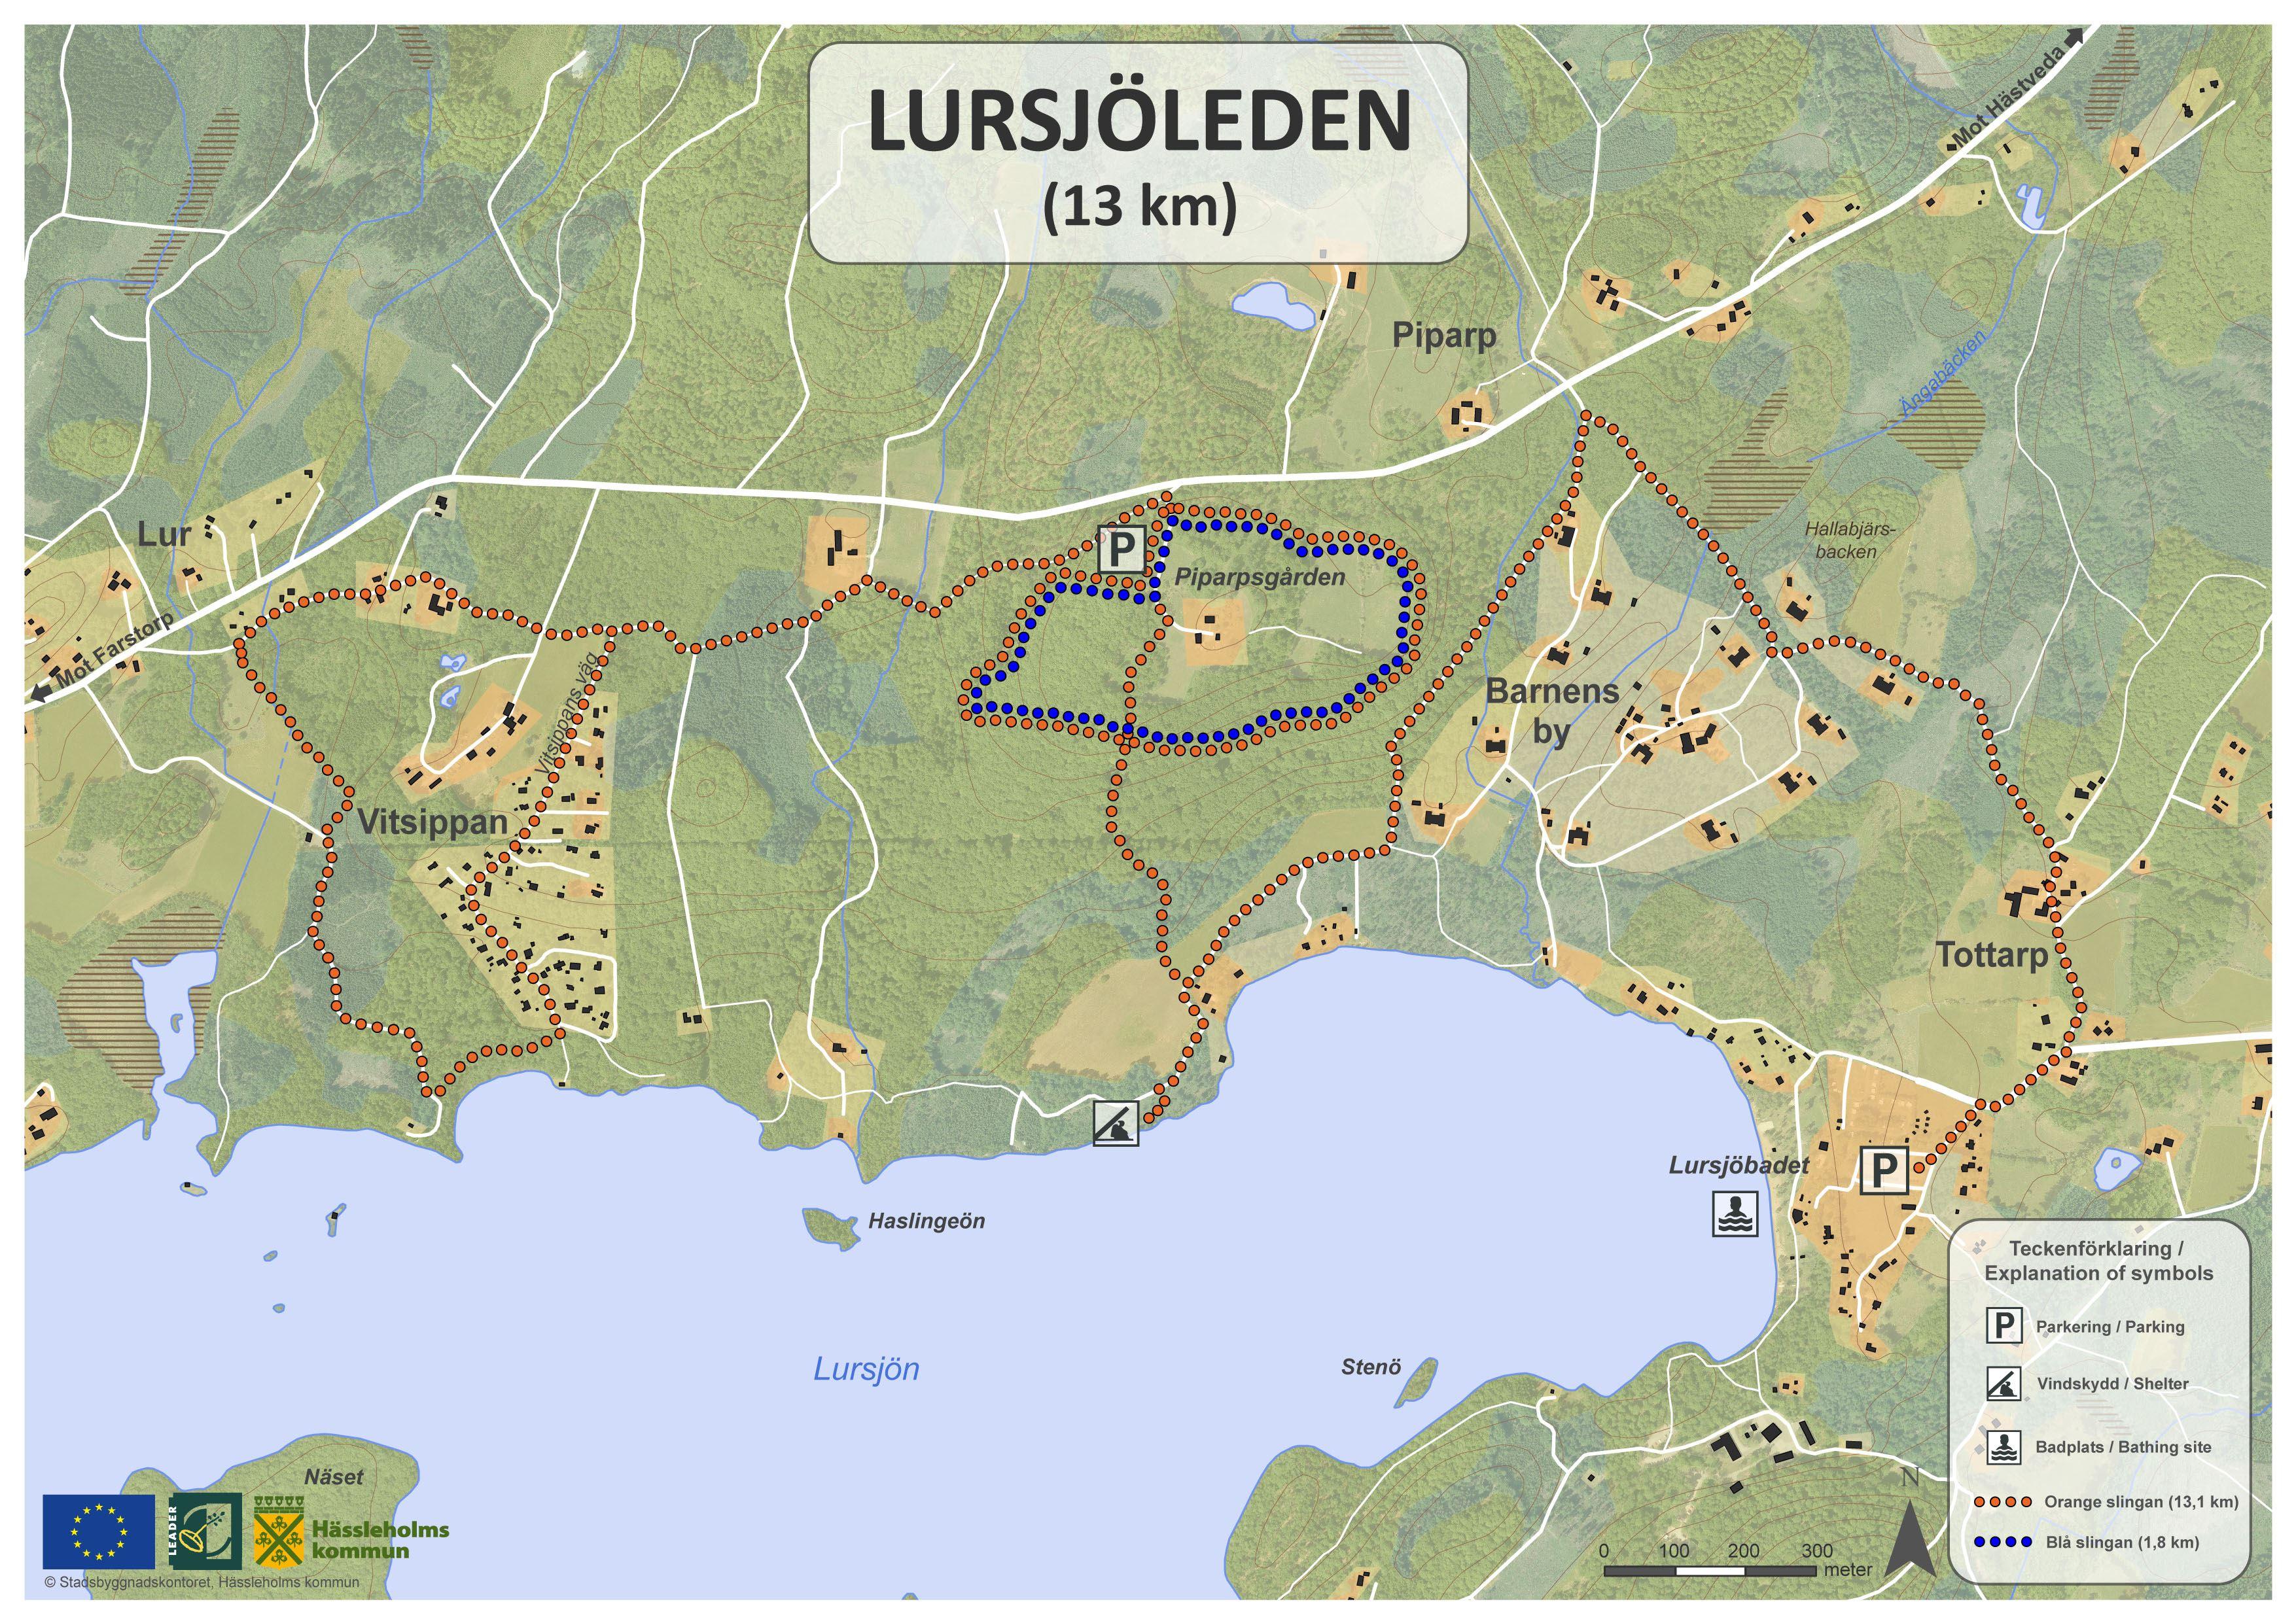 Lursjöleden, Lursjö hiking trail